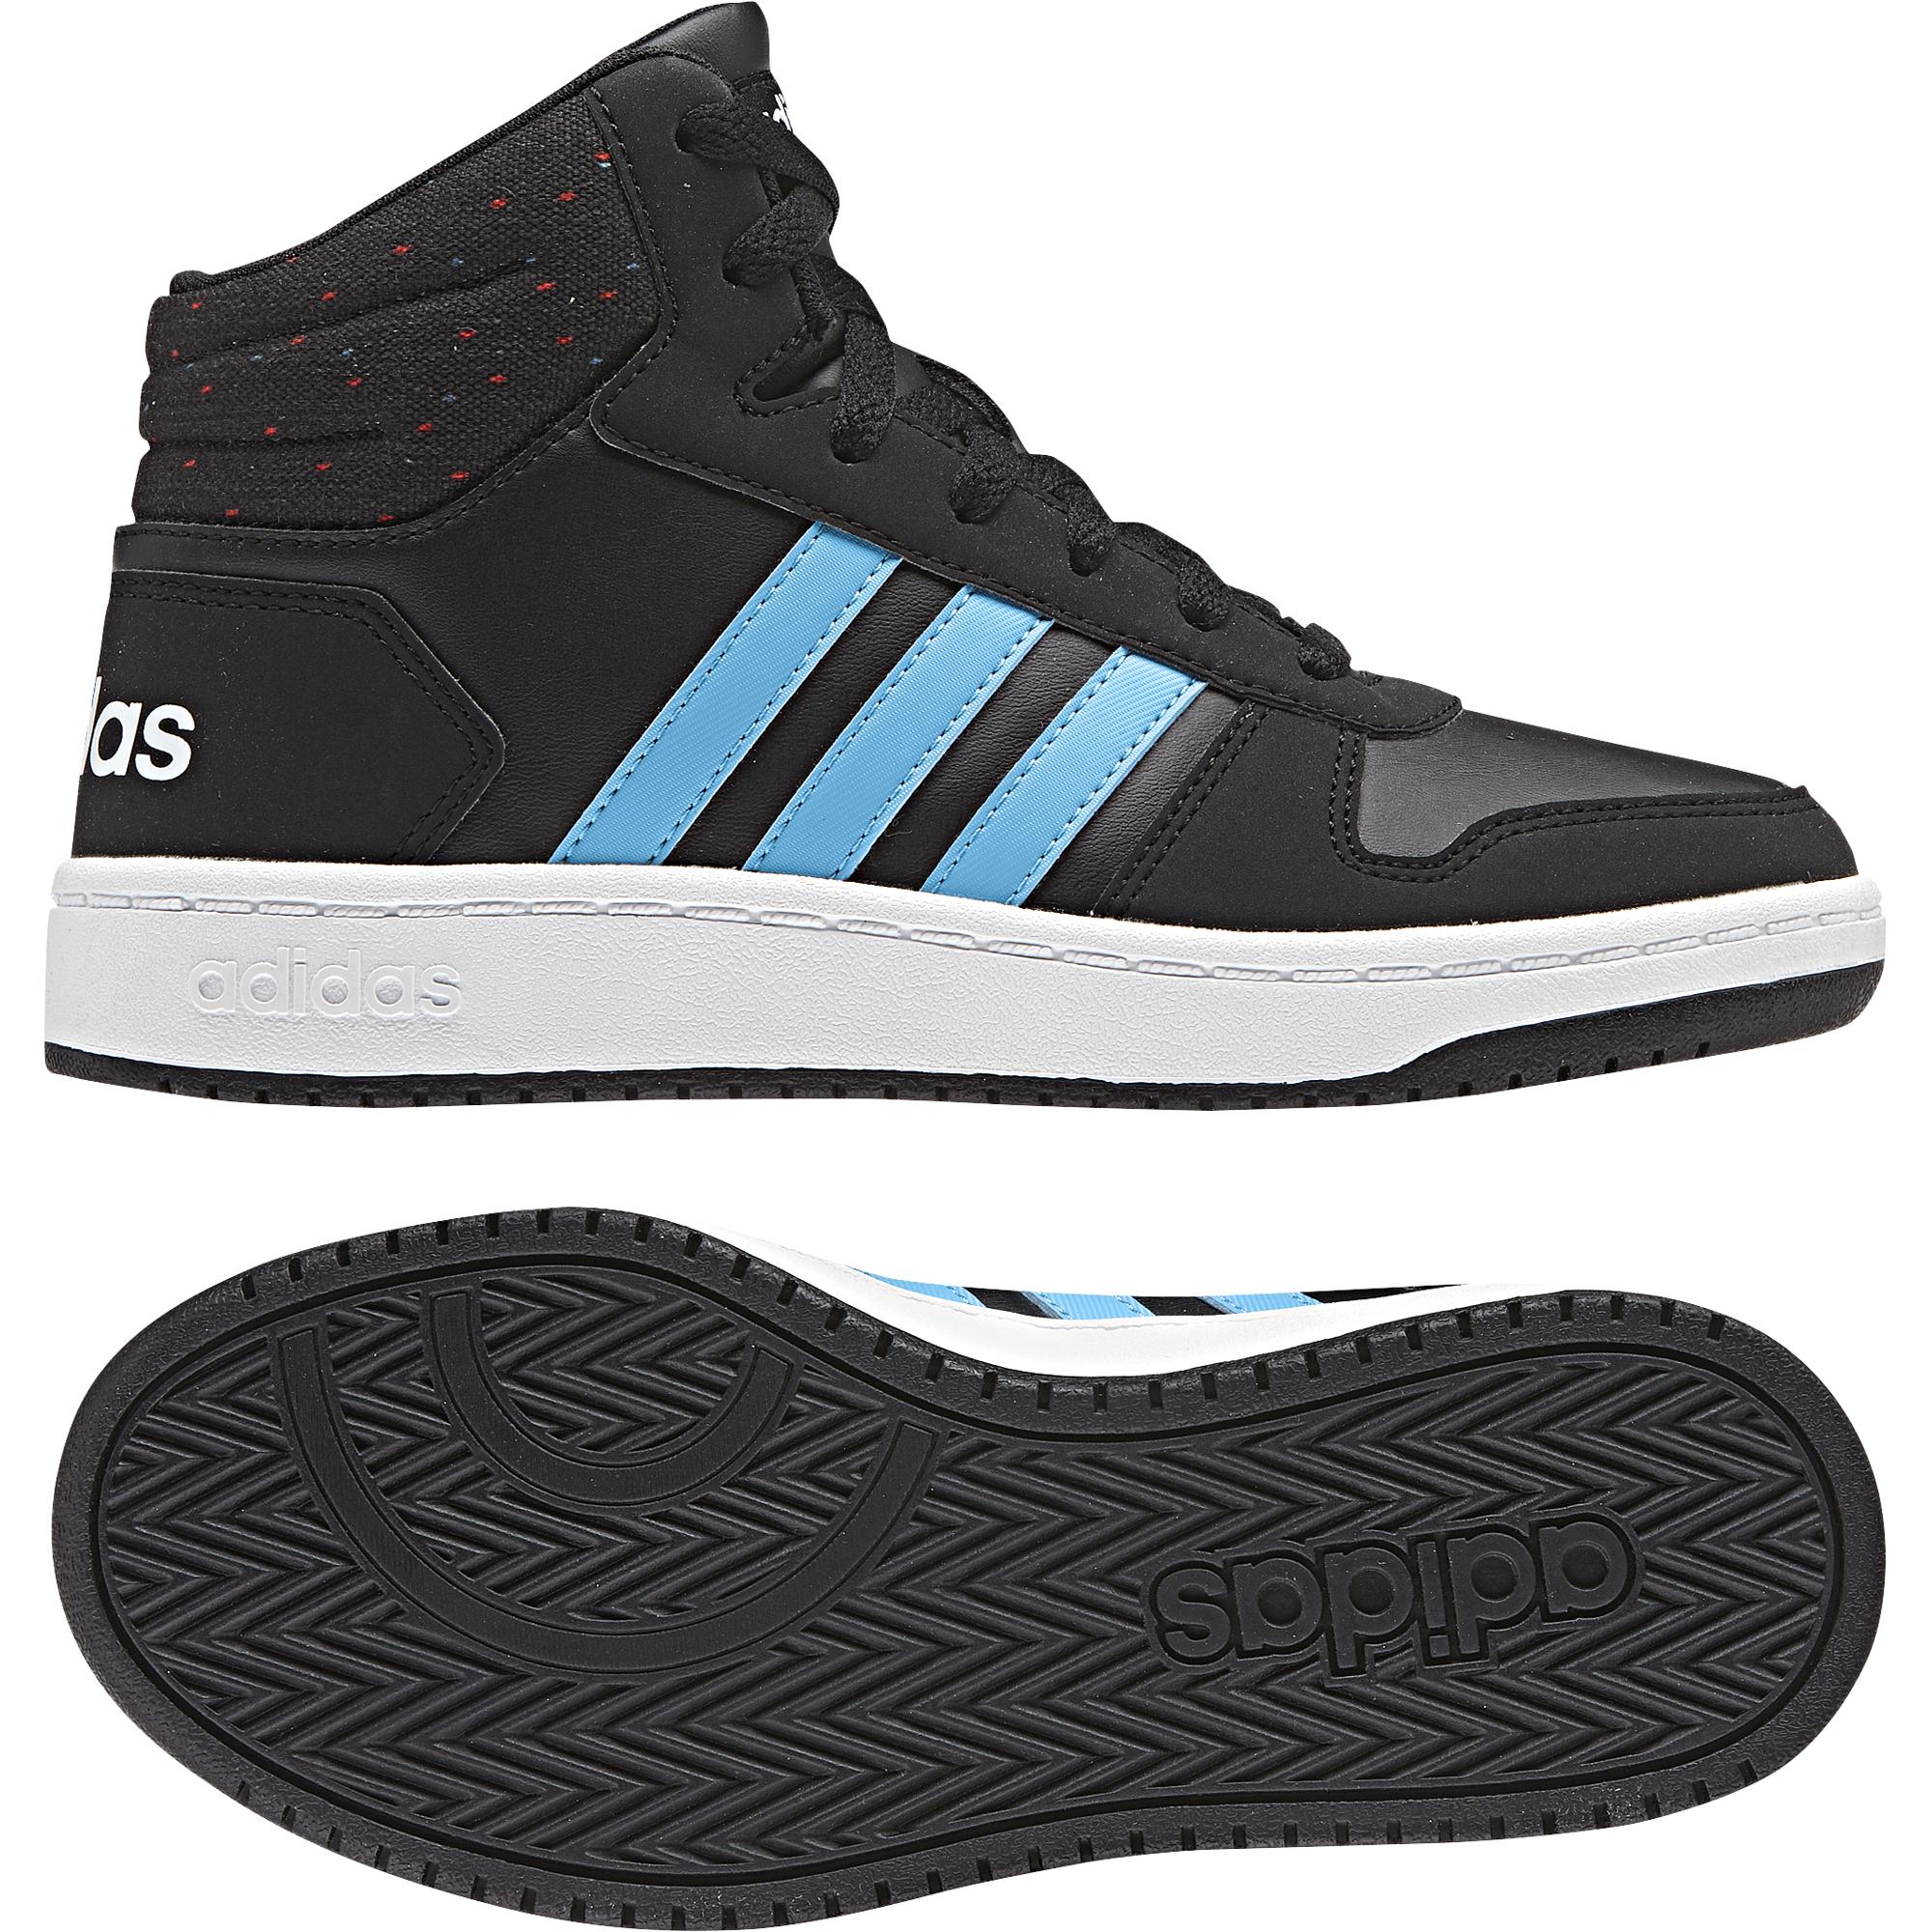 Tenisky adidas HOOPS 2.0 MID K 52c8a94169